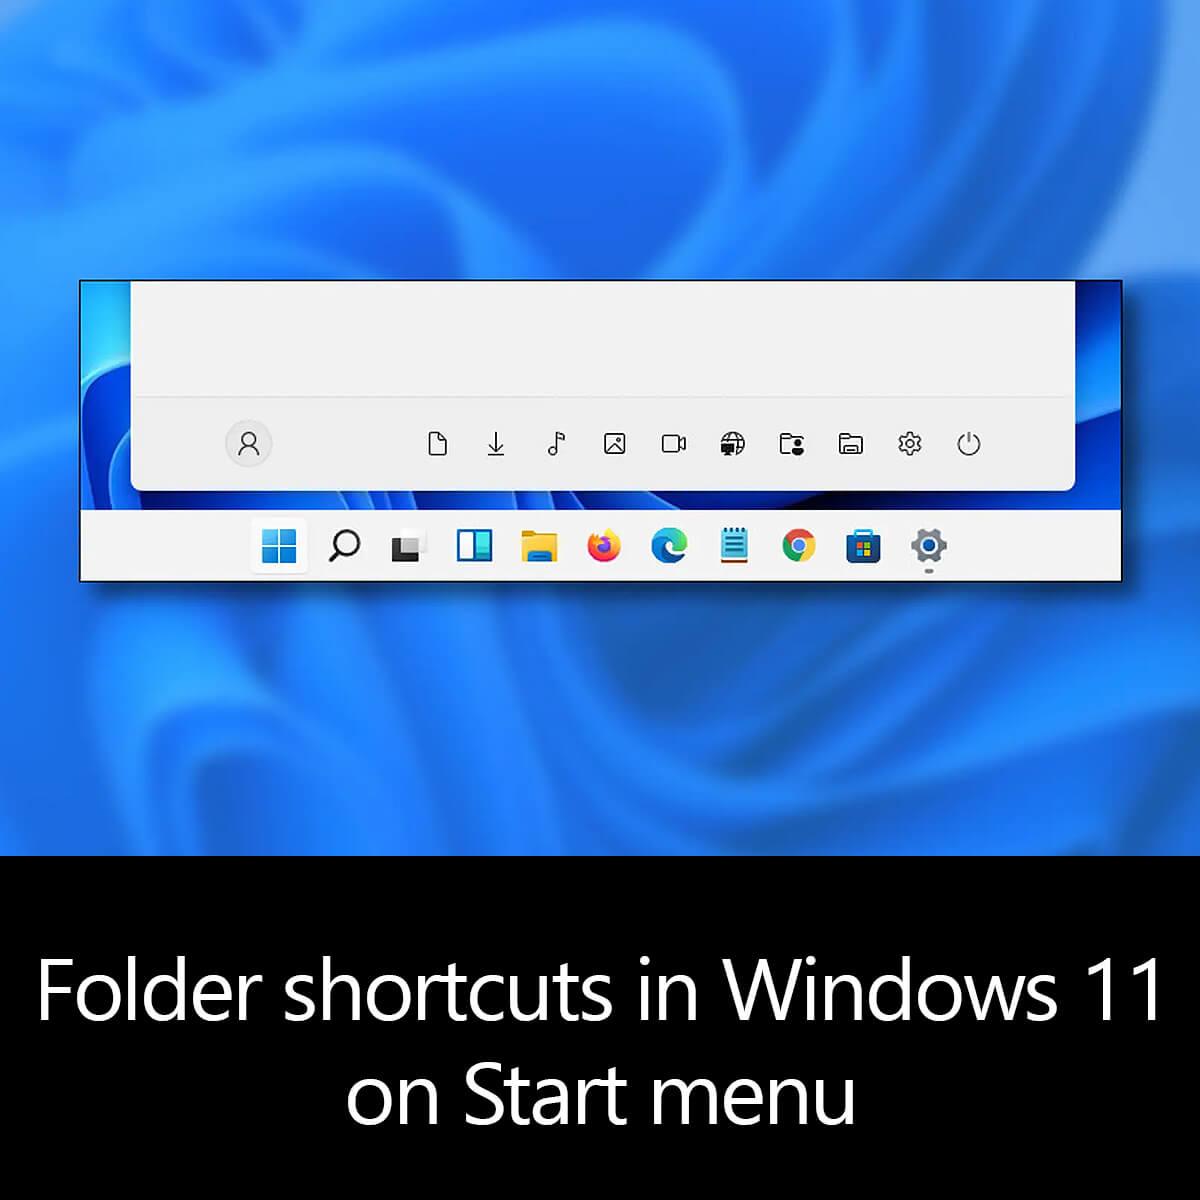 Folder shortcuts in Windows 11 on Start menu